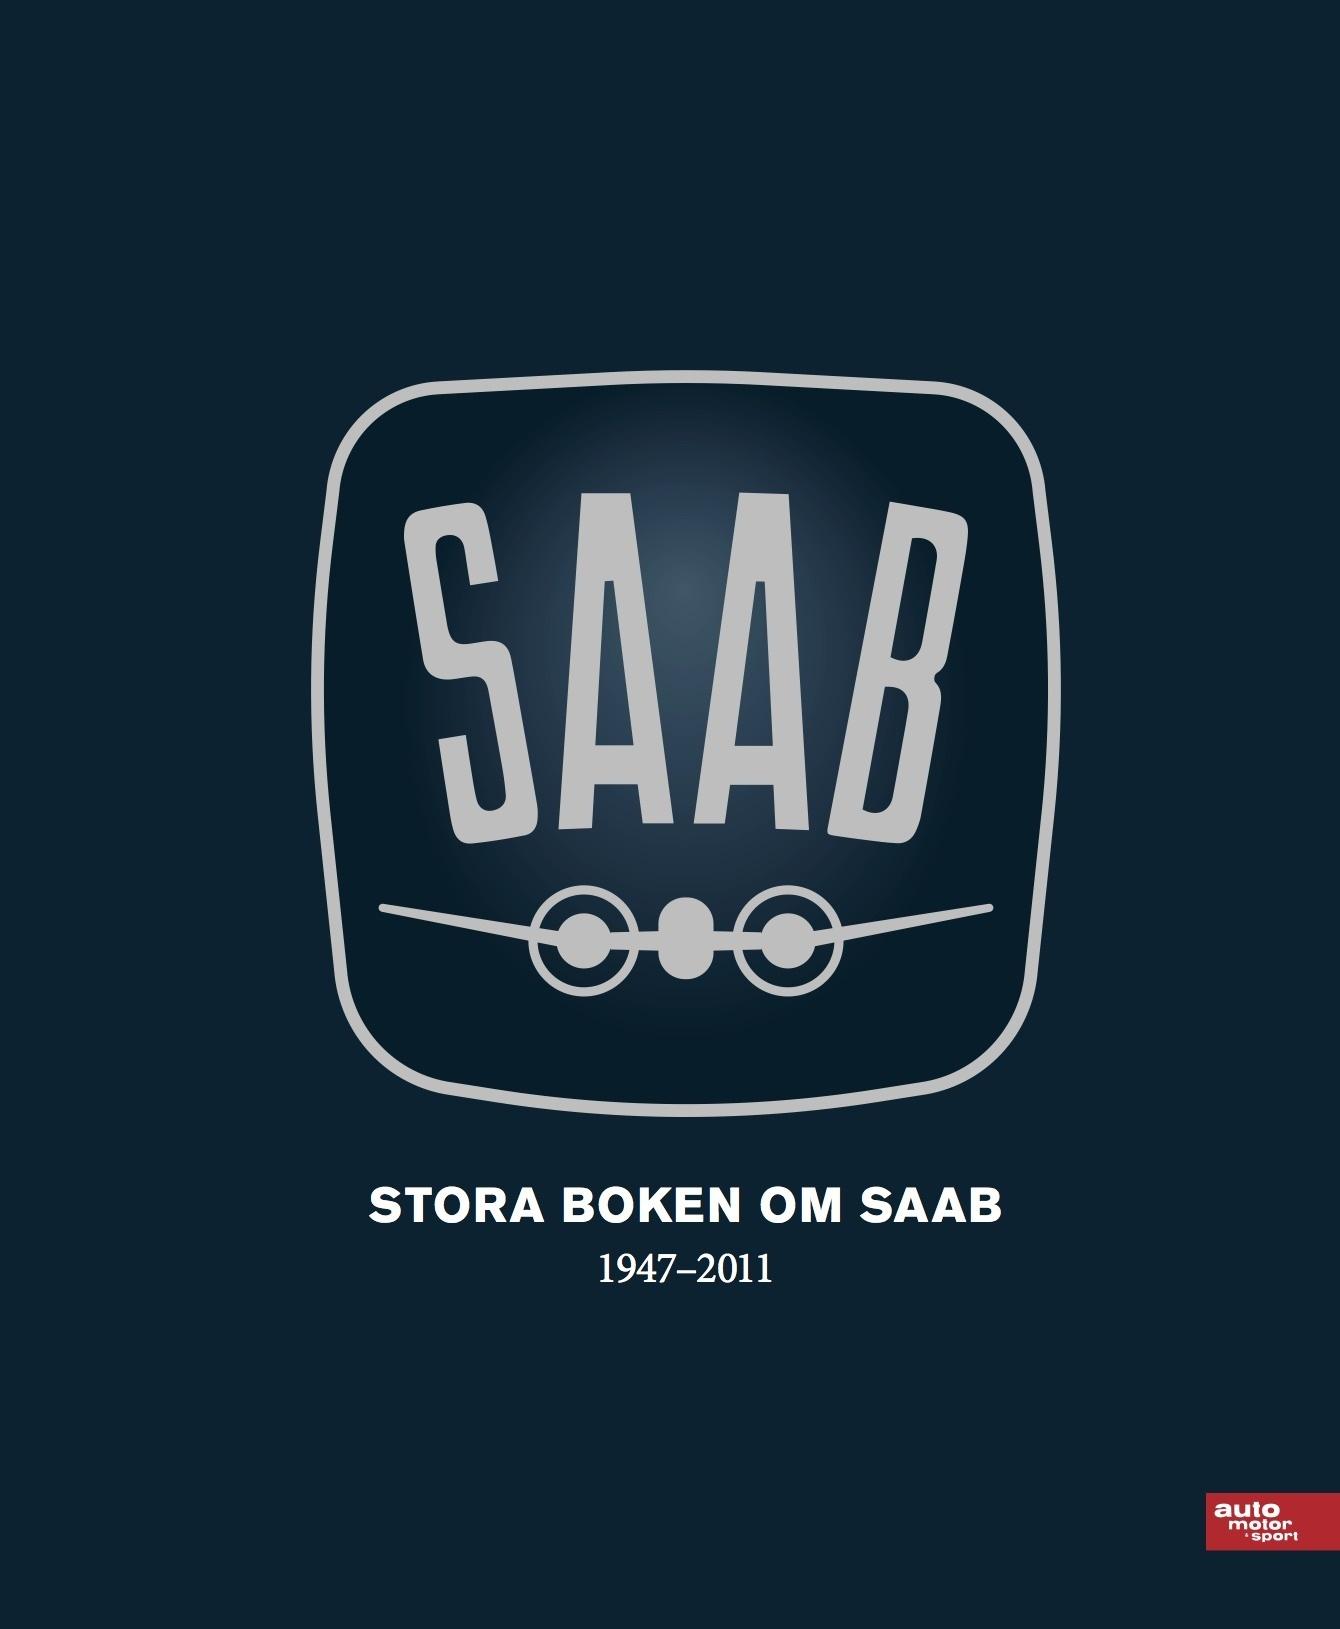 Stora boken om SAAB 1947-2011 85870e416f98d